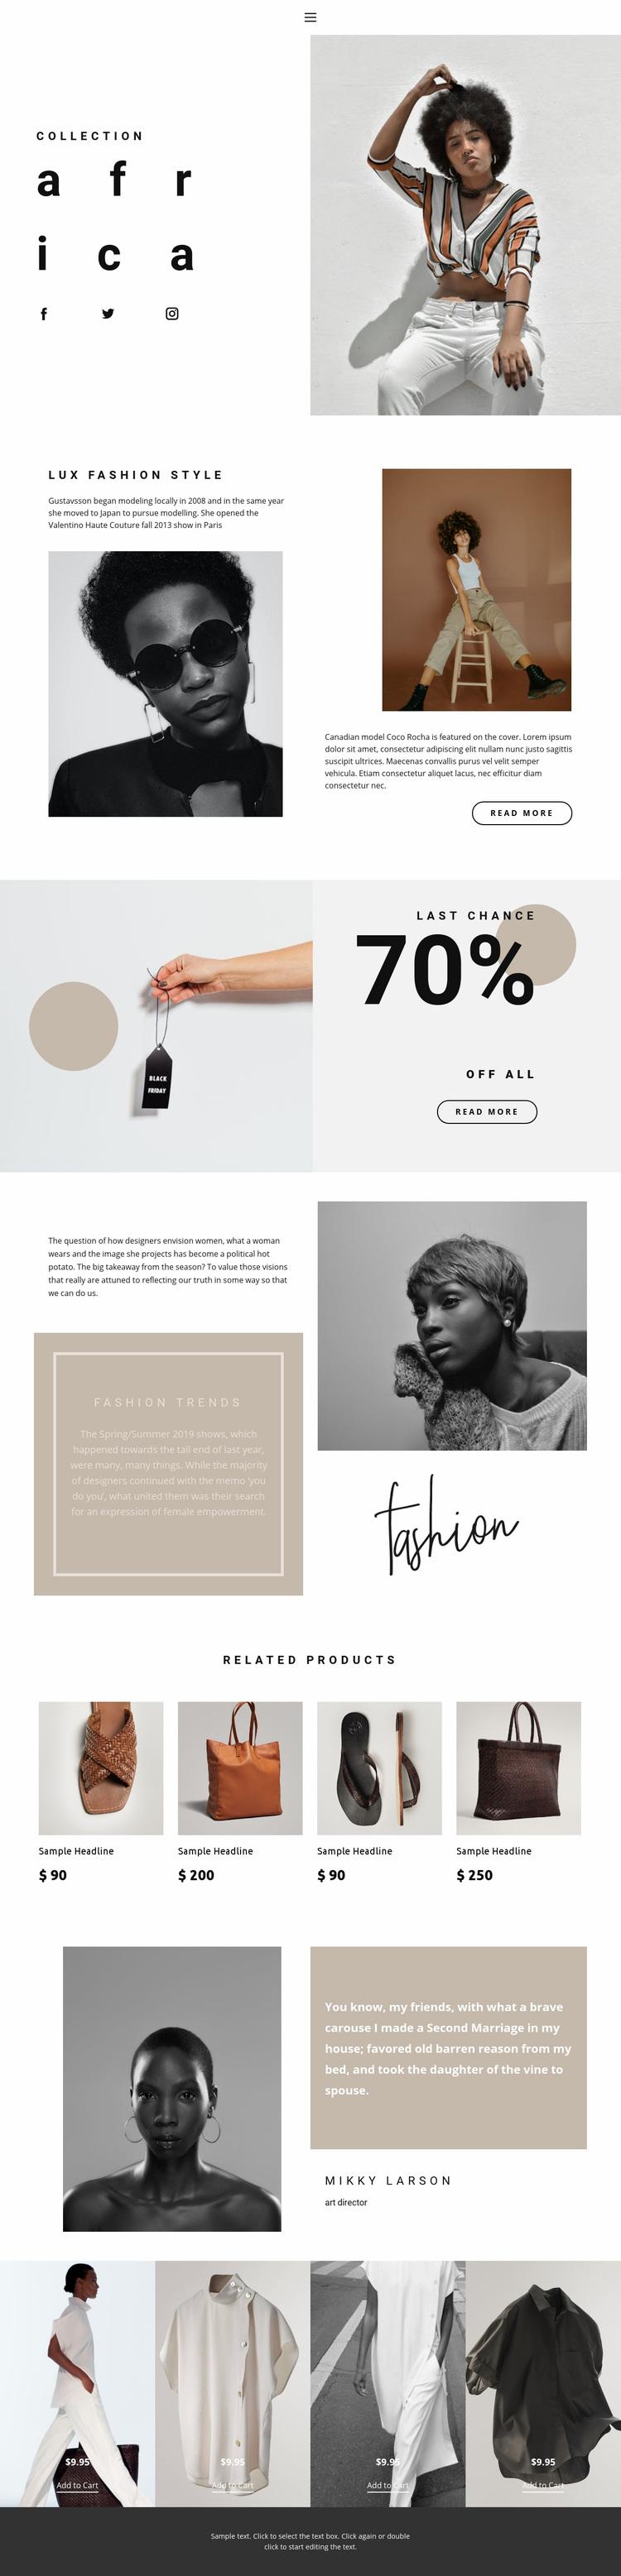 Fashion ideas and advance Web Page Designer